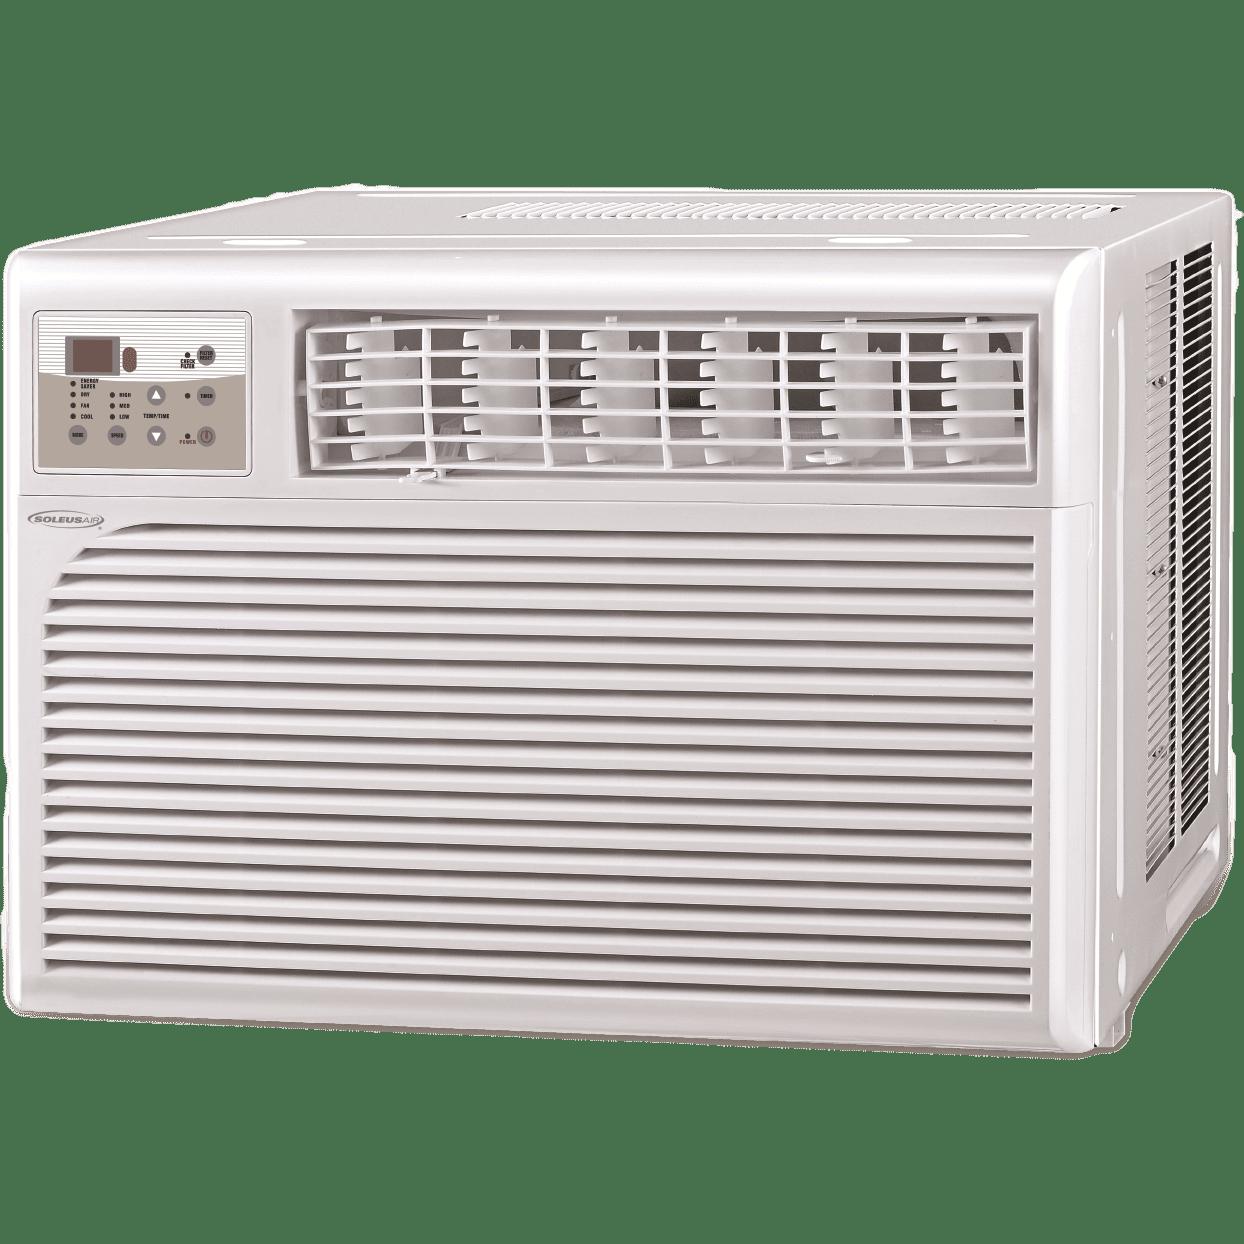 Soleus Air Hcc W15es A1 Window Air Conditioner Free